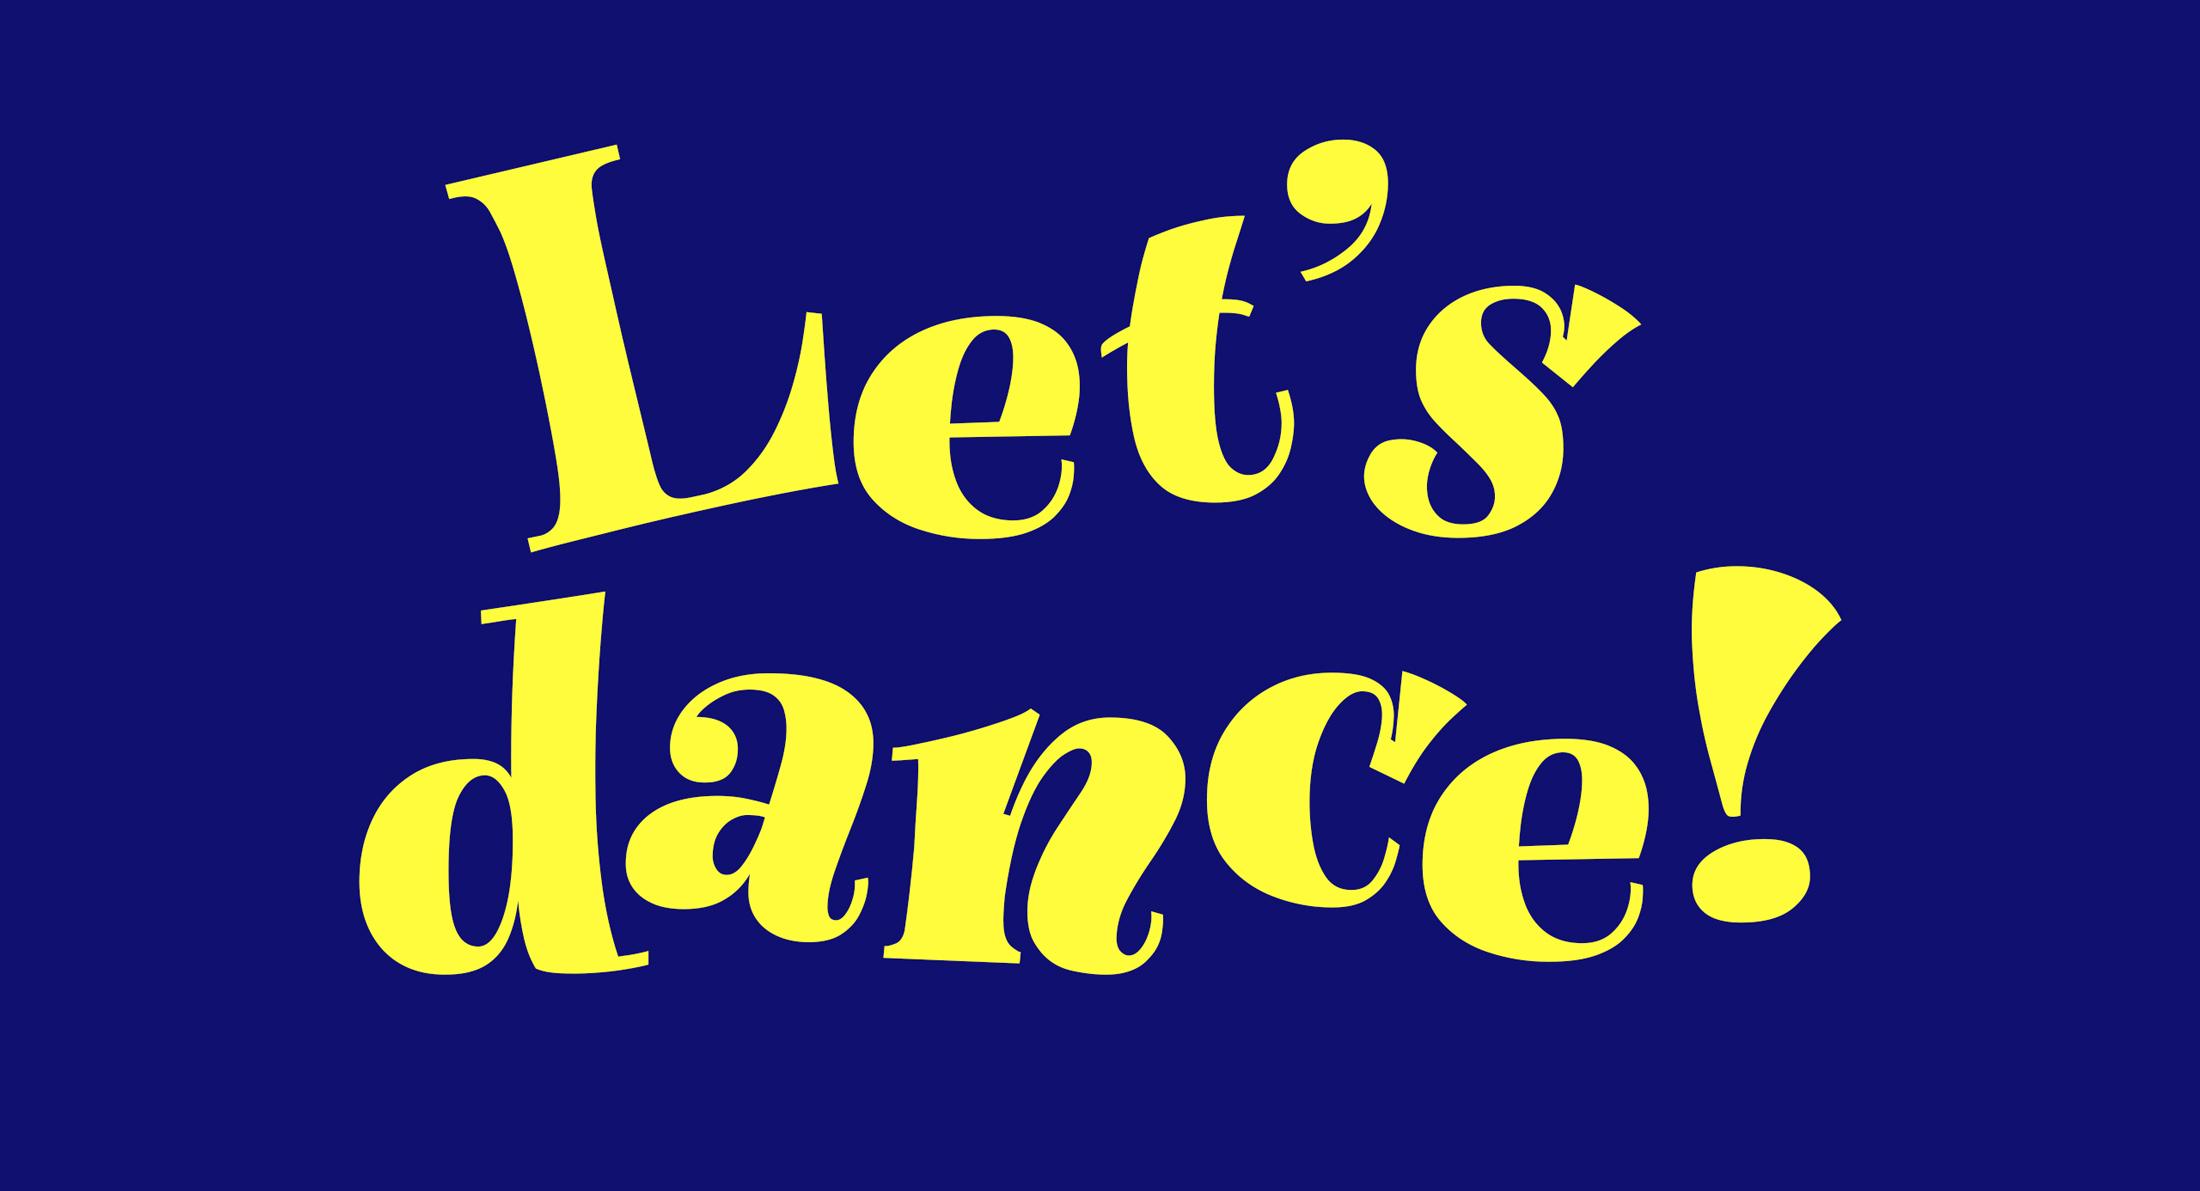 lets-dance-2019-c-gertsch